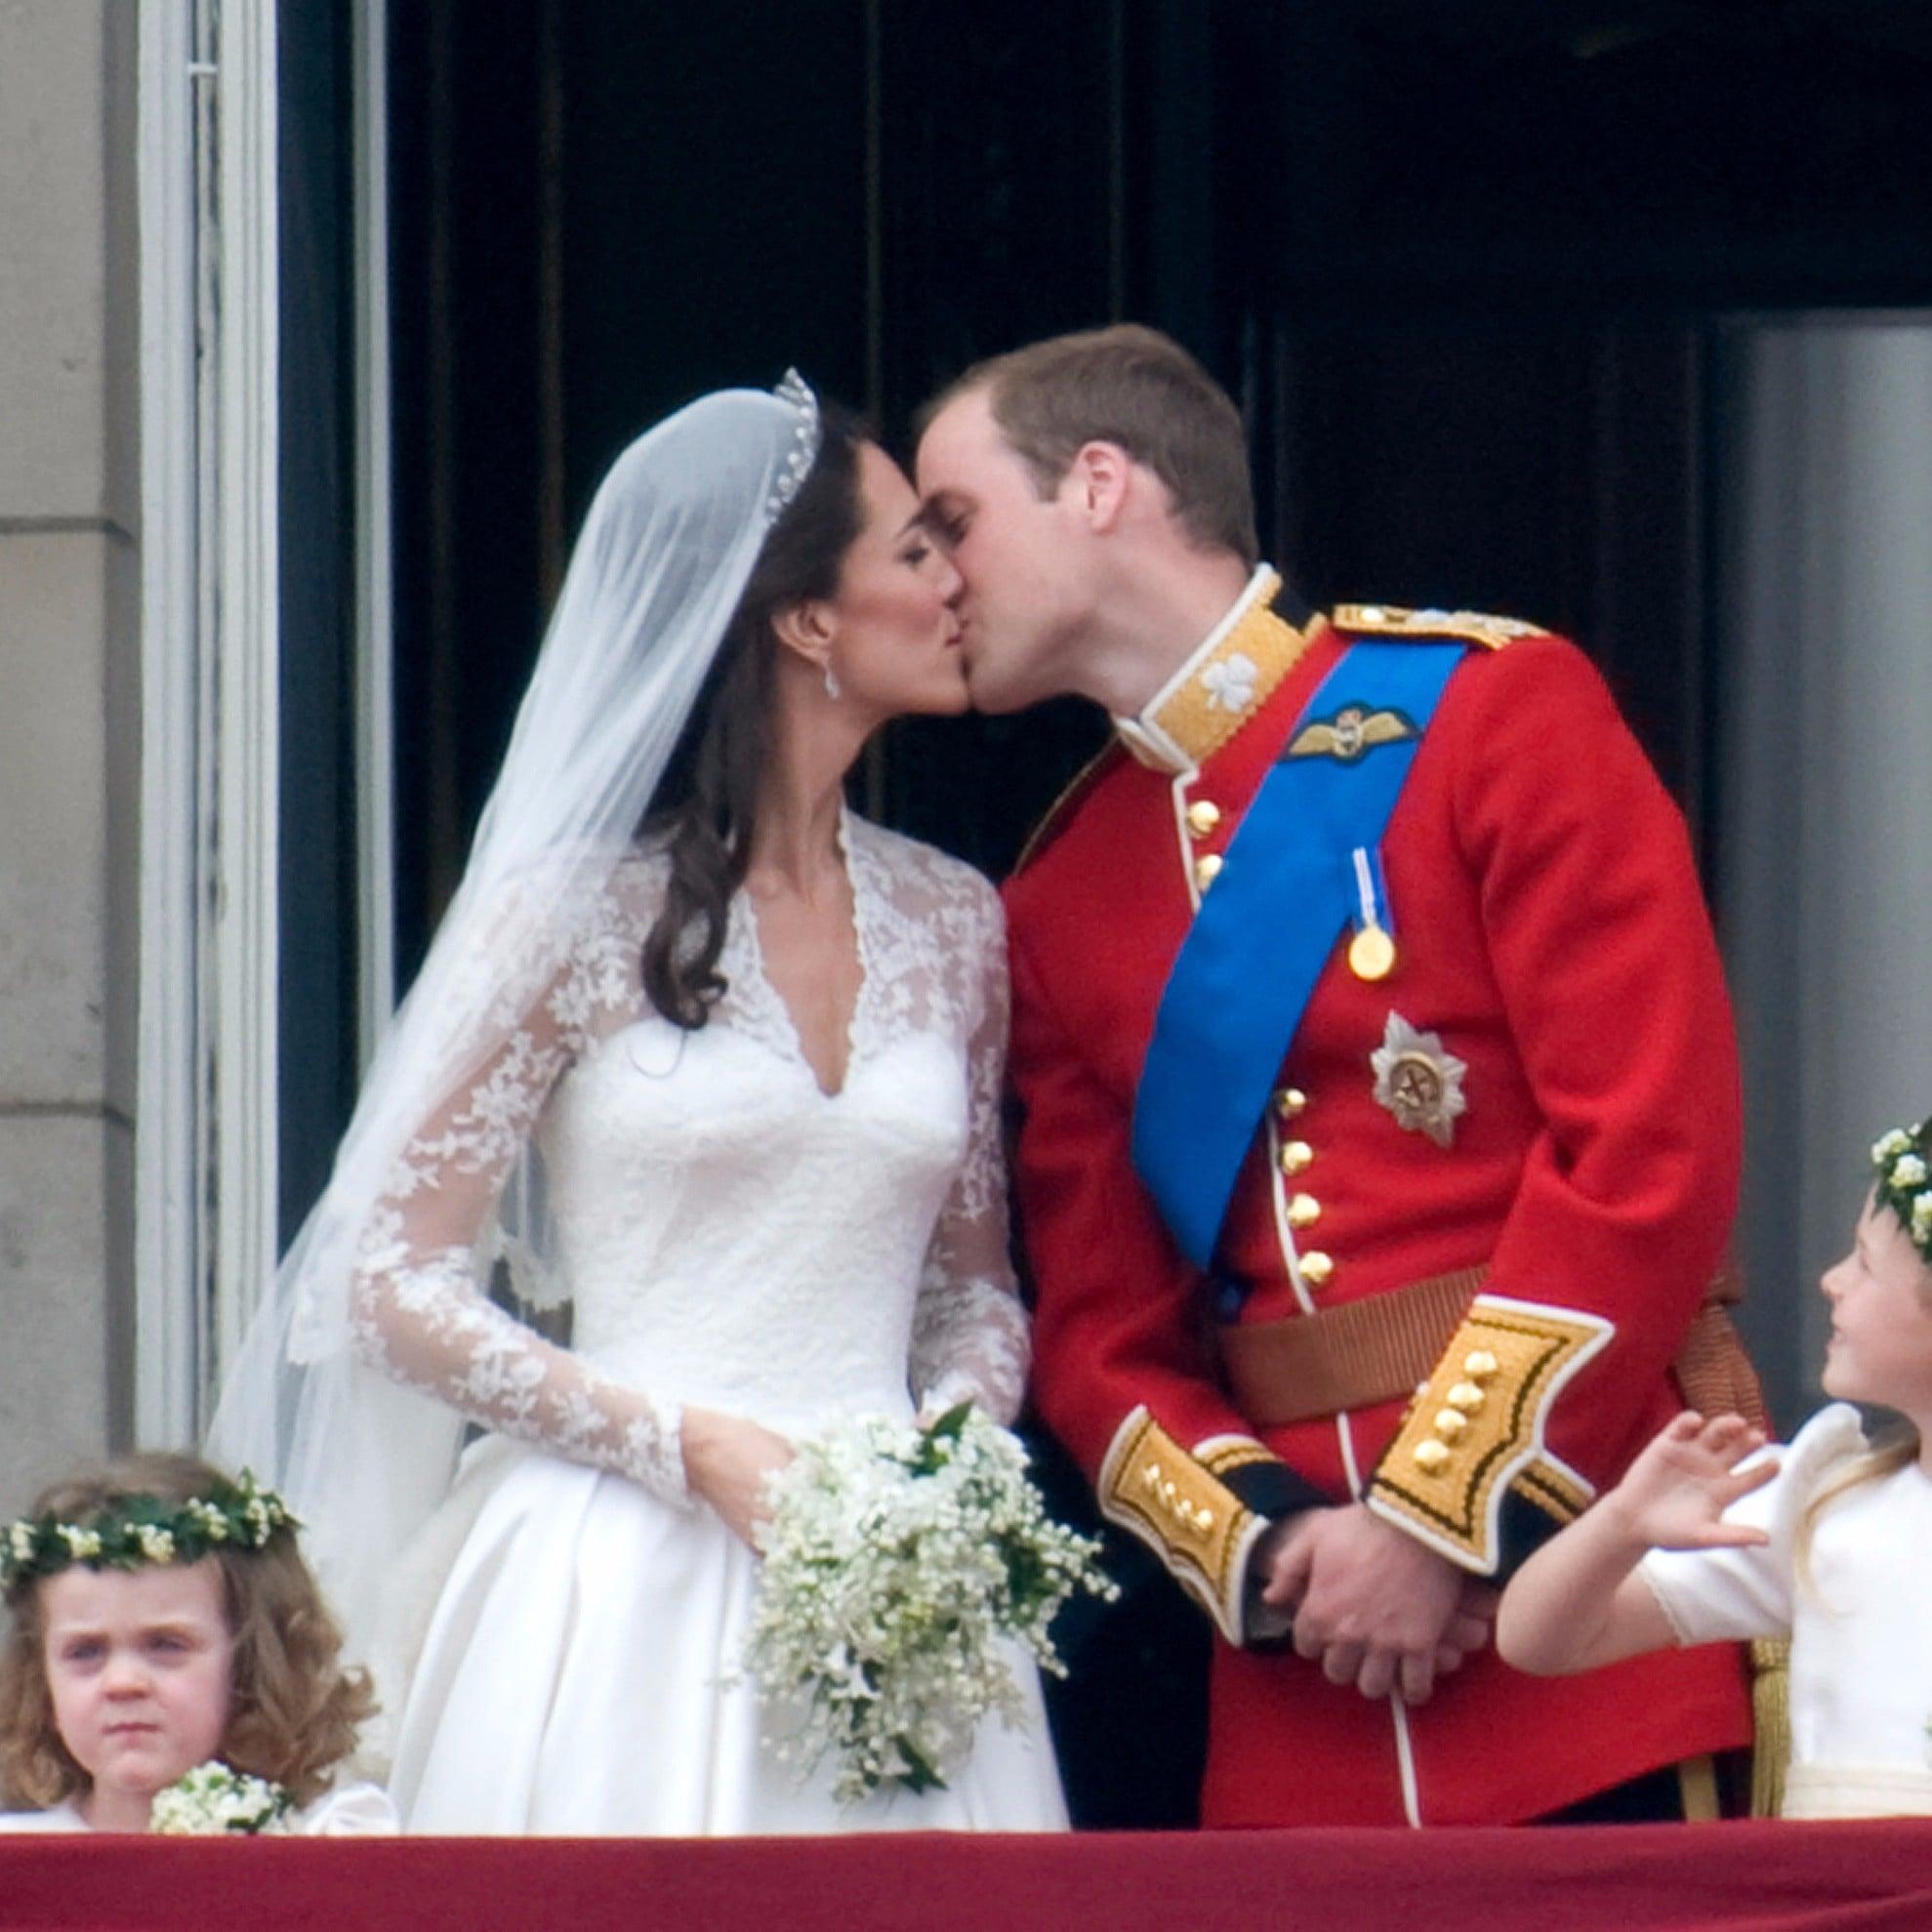 Royal Wedding Traditions | POPSUGAR Celebrity